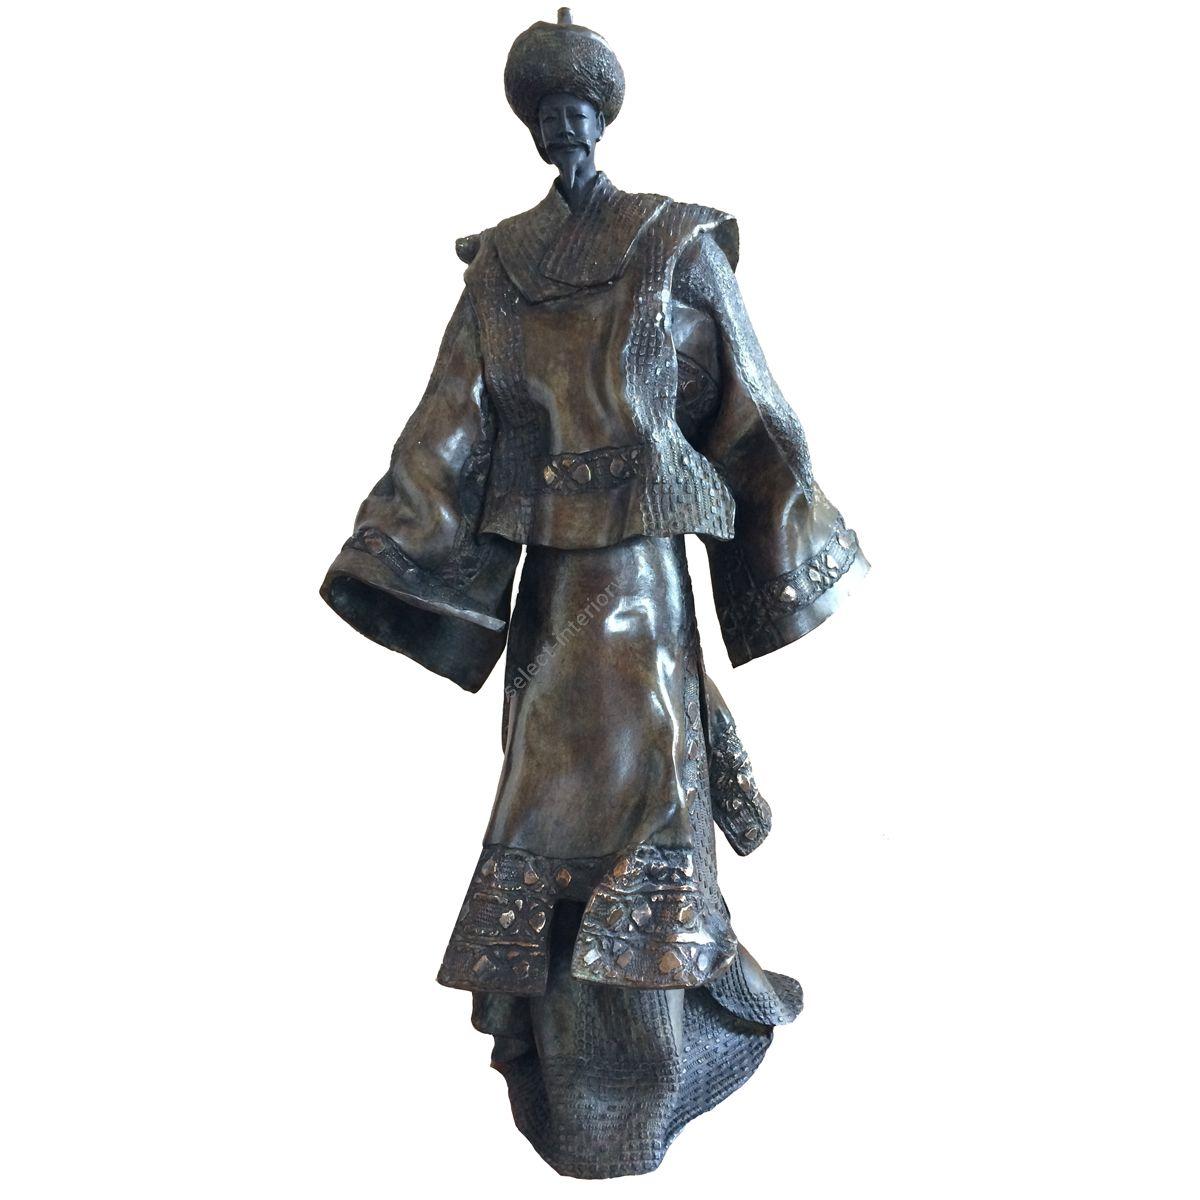 Paul Beckrich / Sculpture Le Mandarin / New in Stock